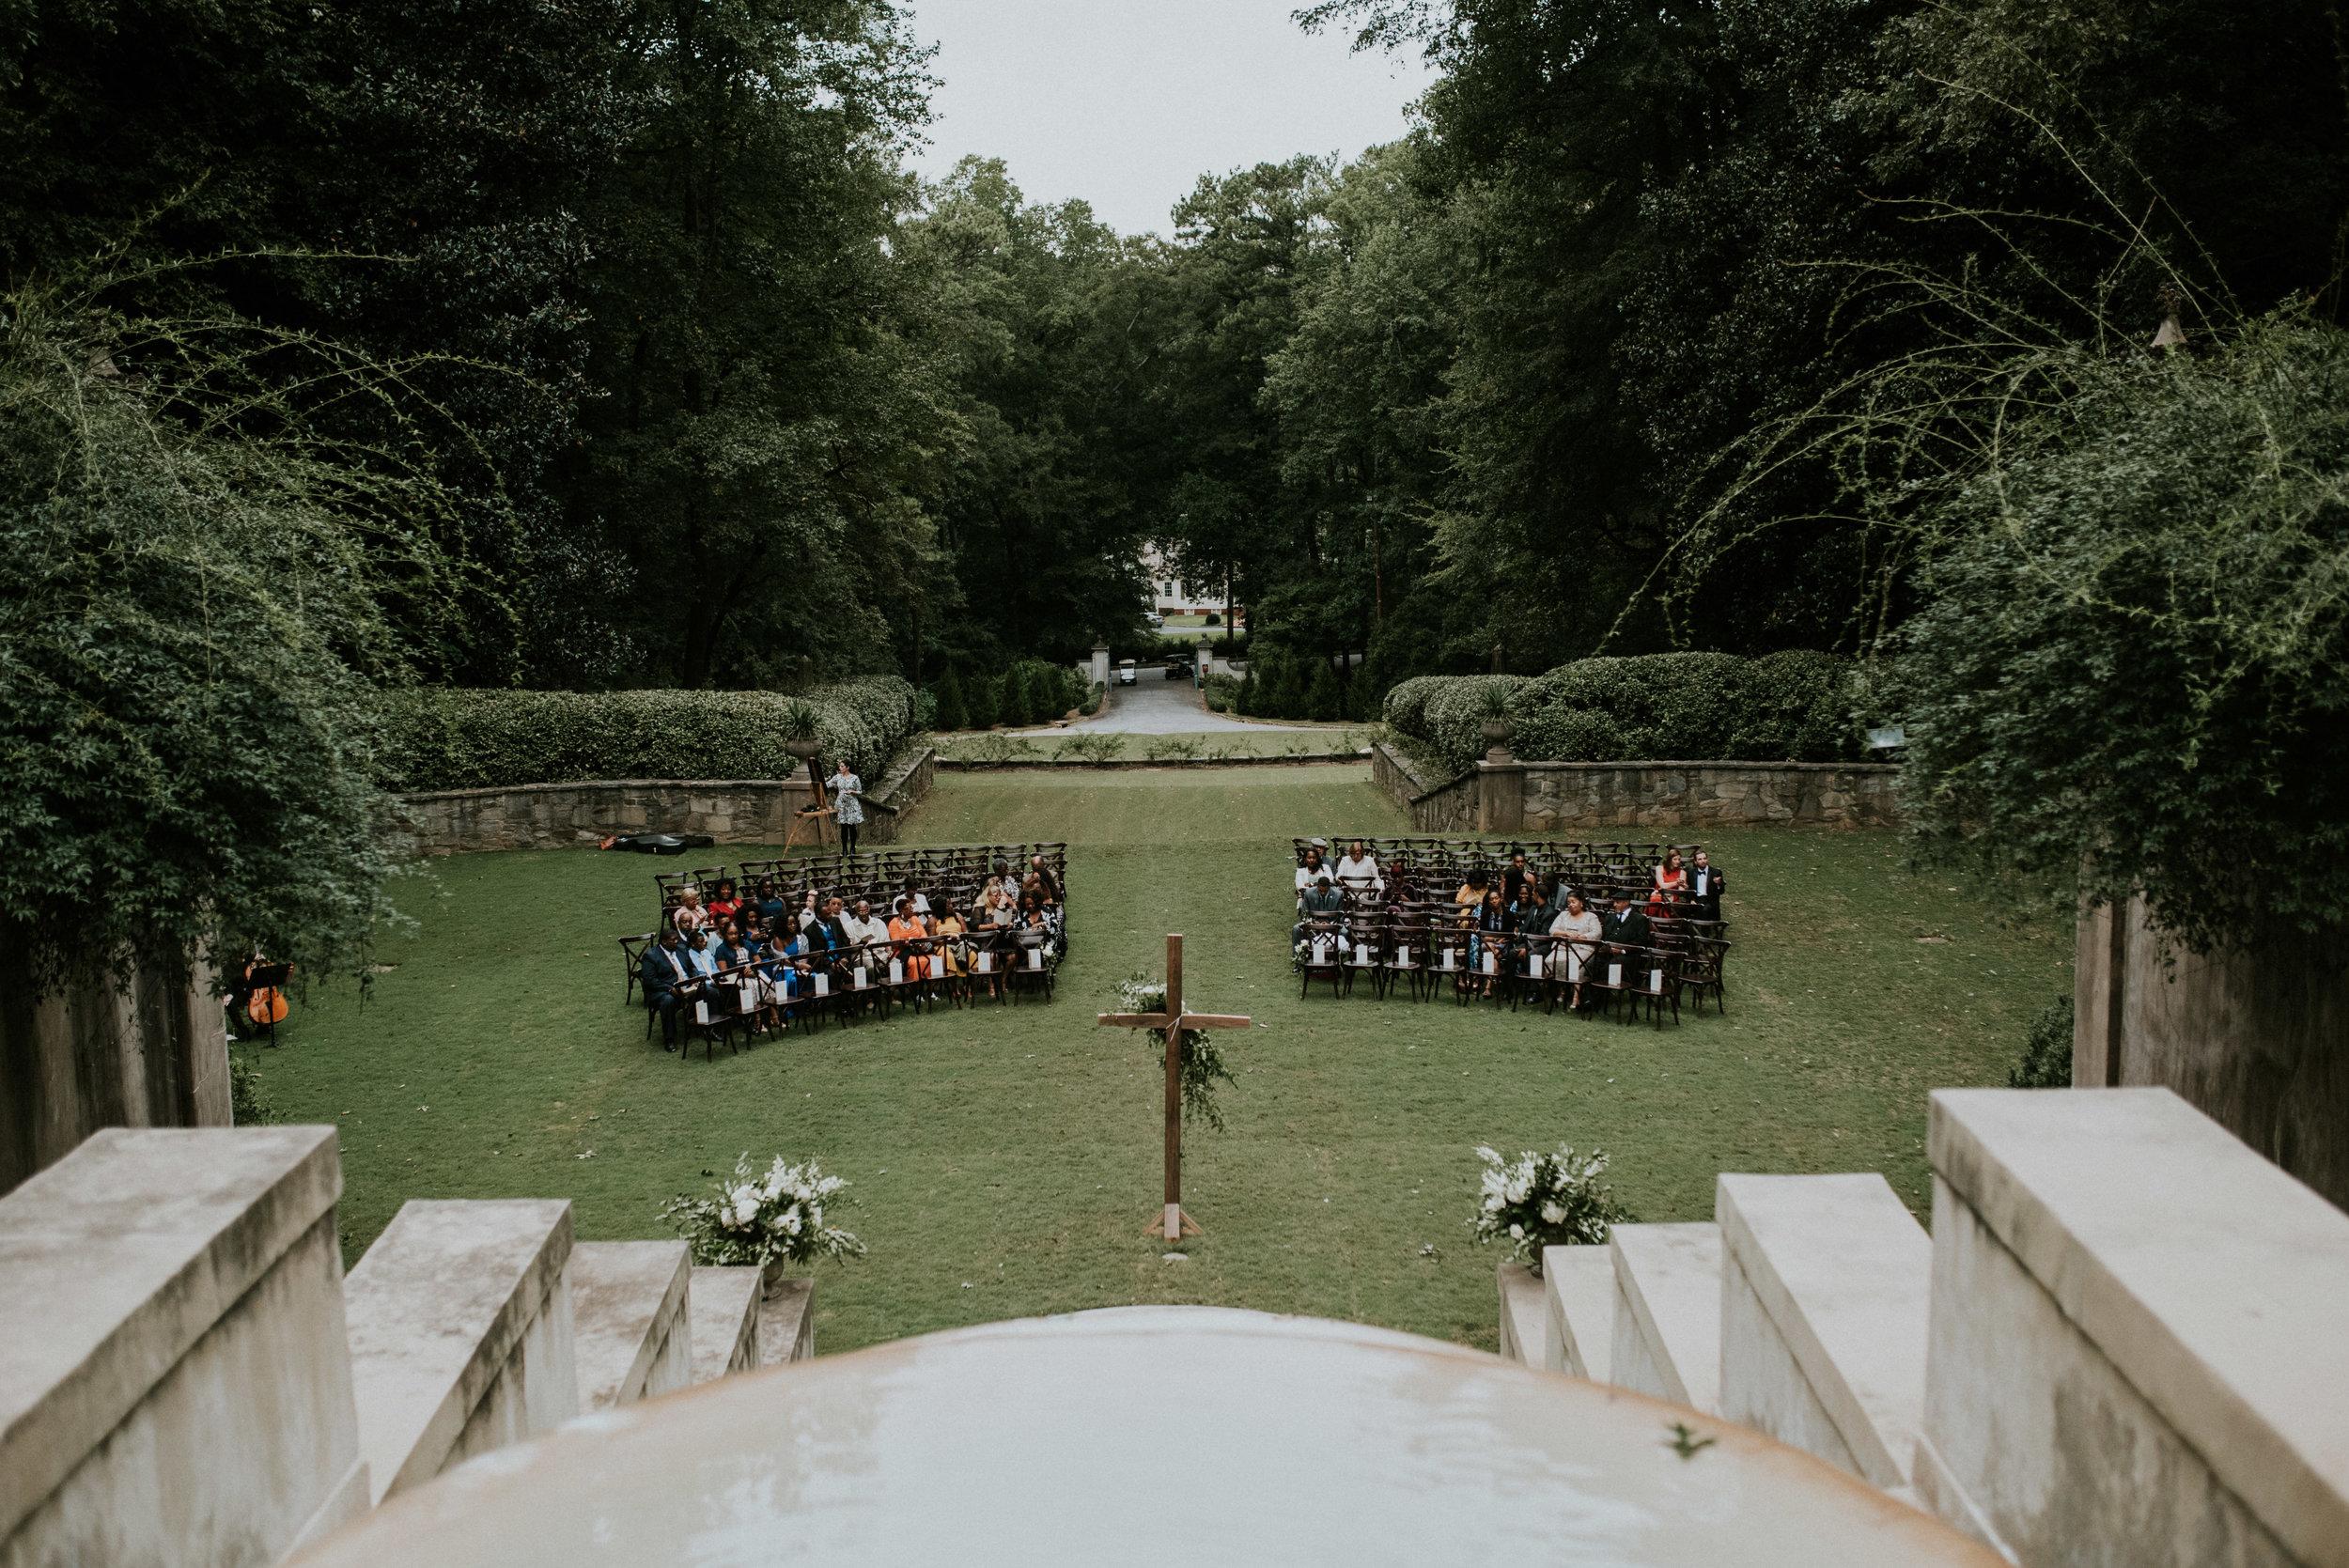 Swan House lawn wedding ceremony in Atlanta, GA